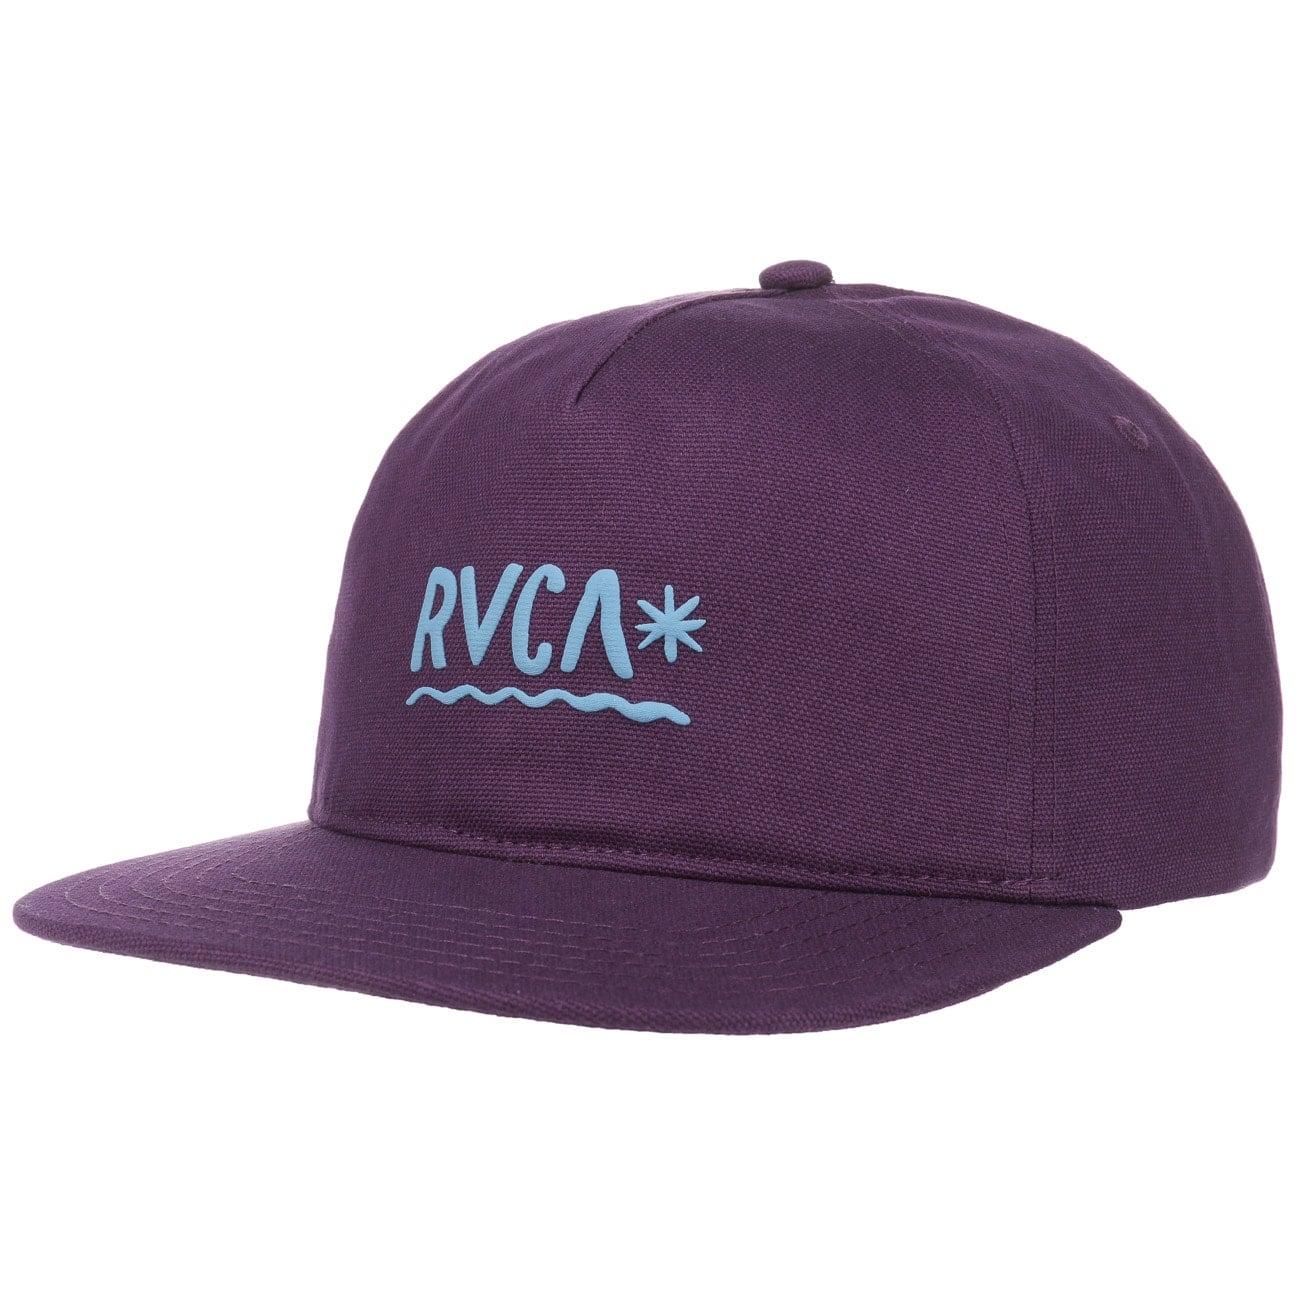 Casquette Snapback Squig by RVCA  baseball cap